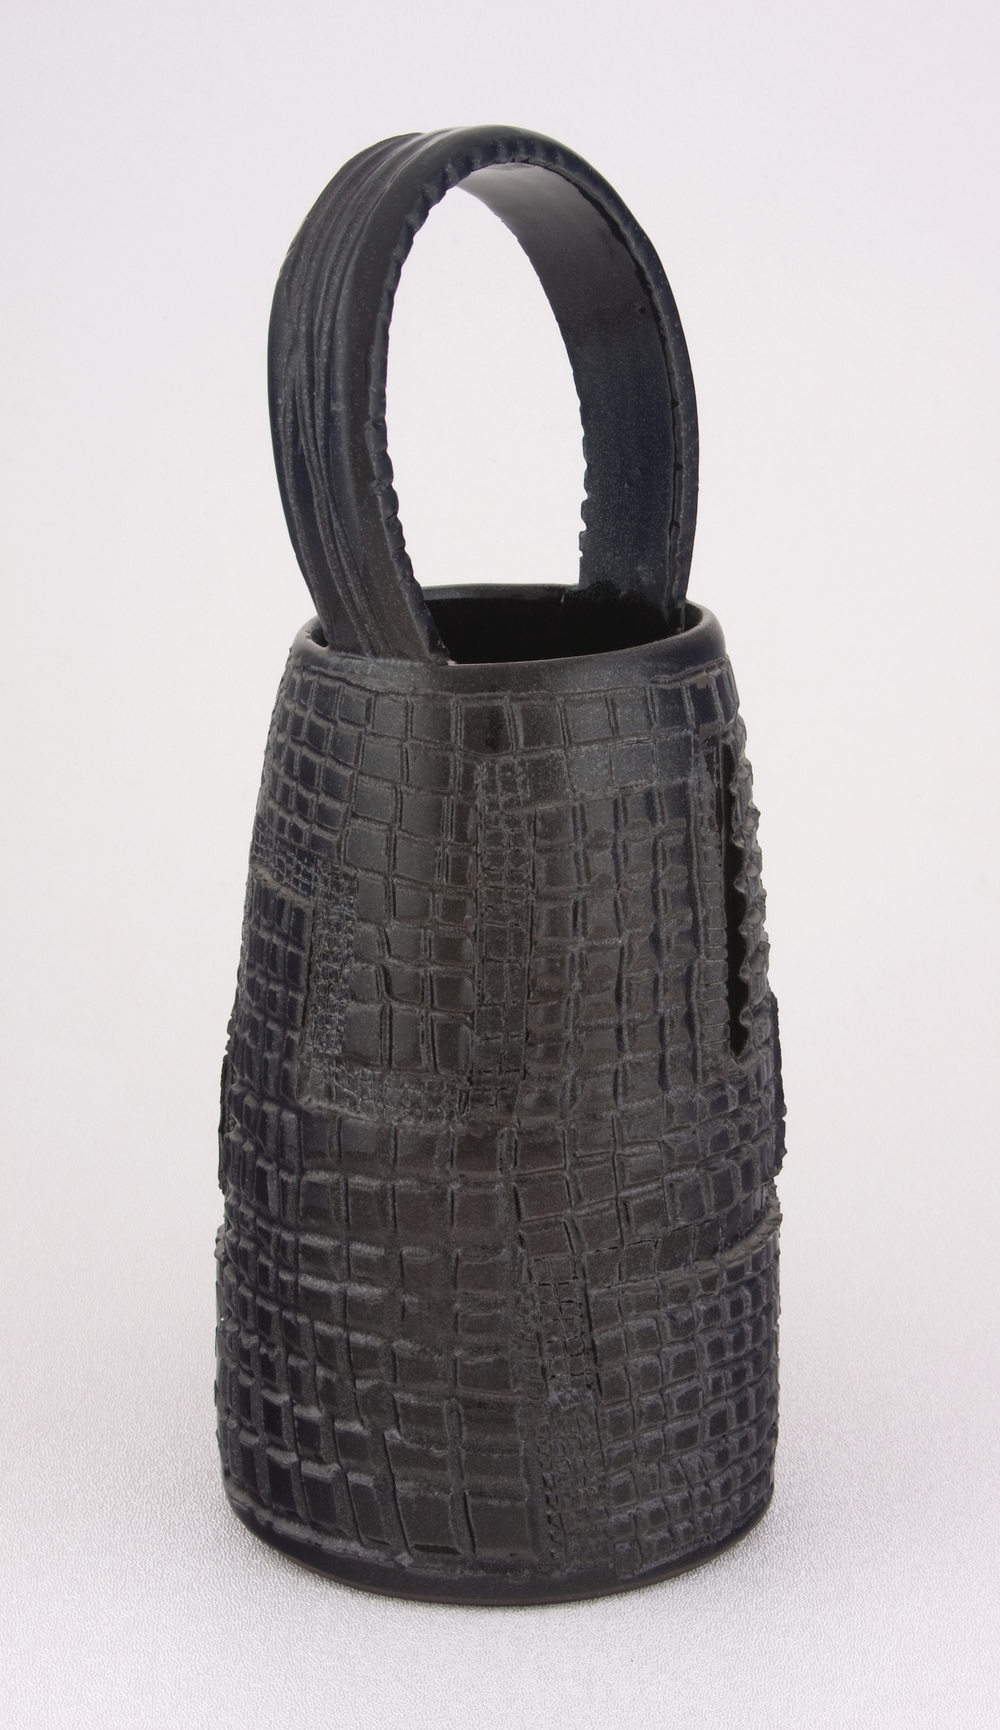 Shio Kusaka  Untitled (clay basket 1)  2005 Stoneware 10 3/4h x 4 1/2w x 4 1/2d in SK001